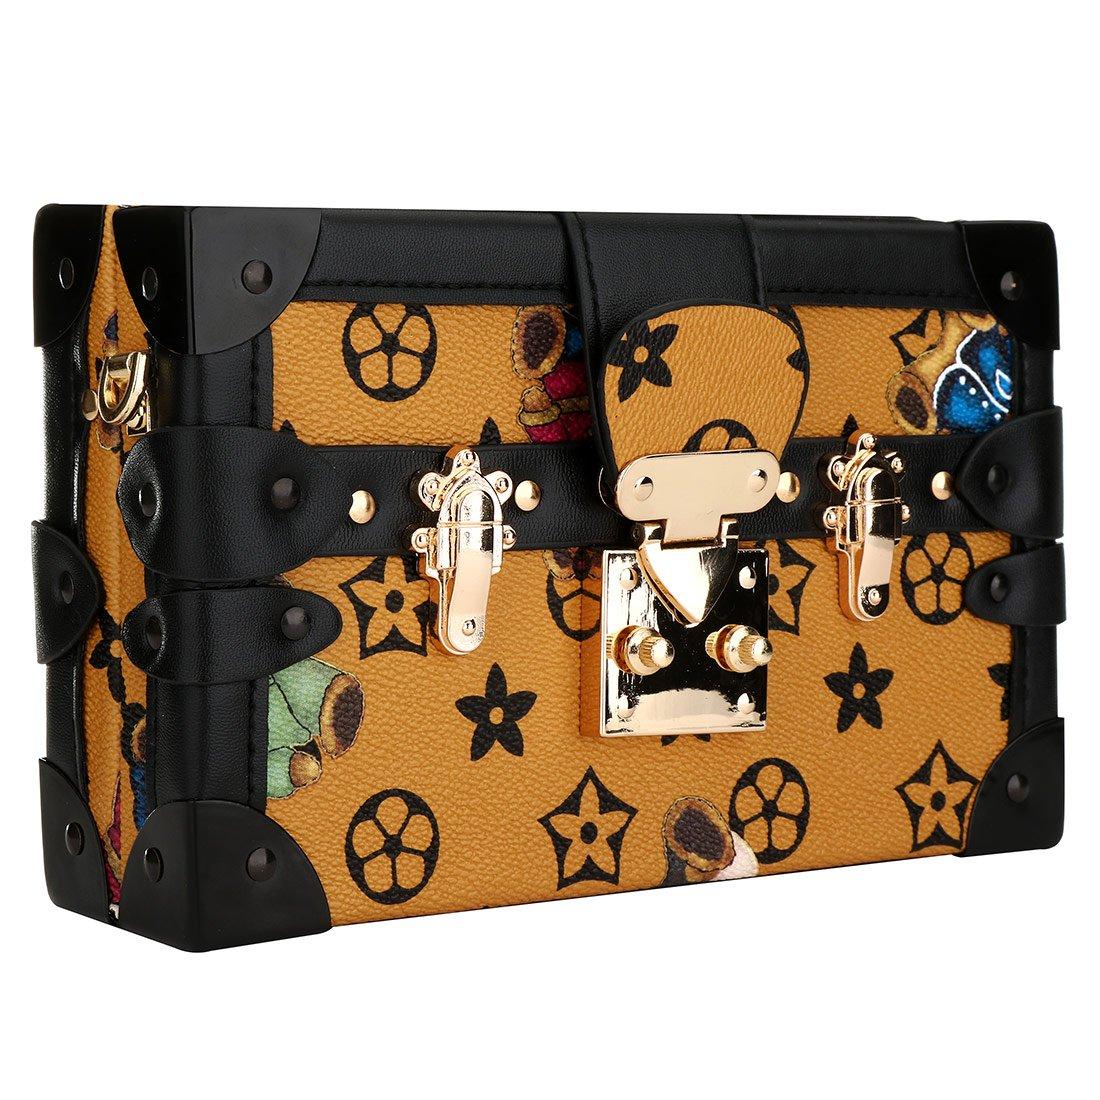 EROUGE Designer Handbags PU Leather Satchel Handbags Women Shoulder Bag for Wedding Party(Khaki)